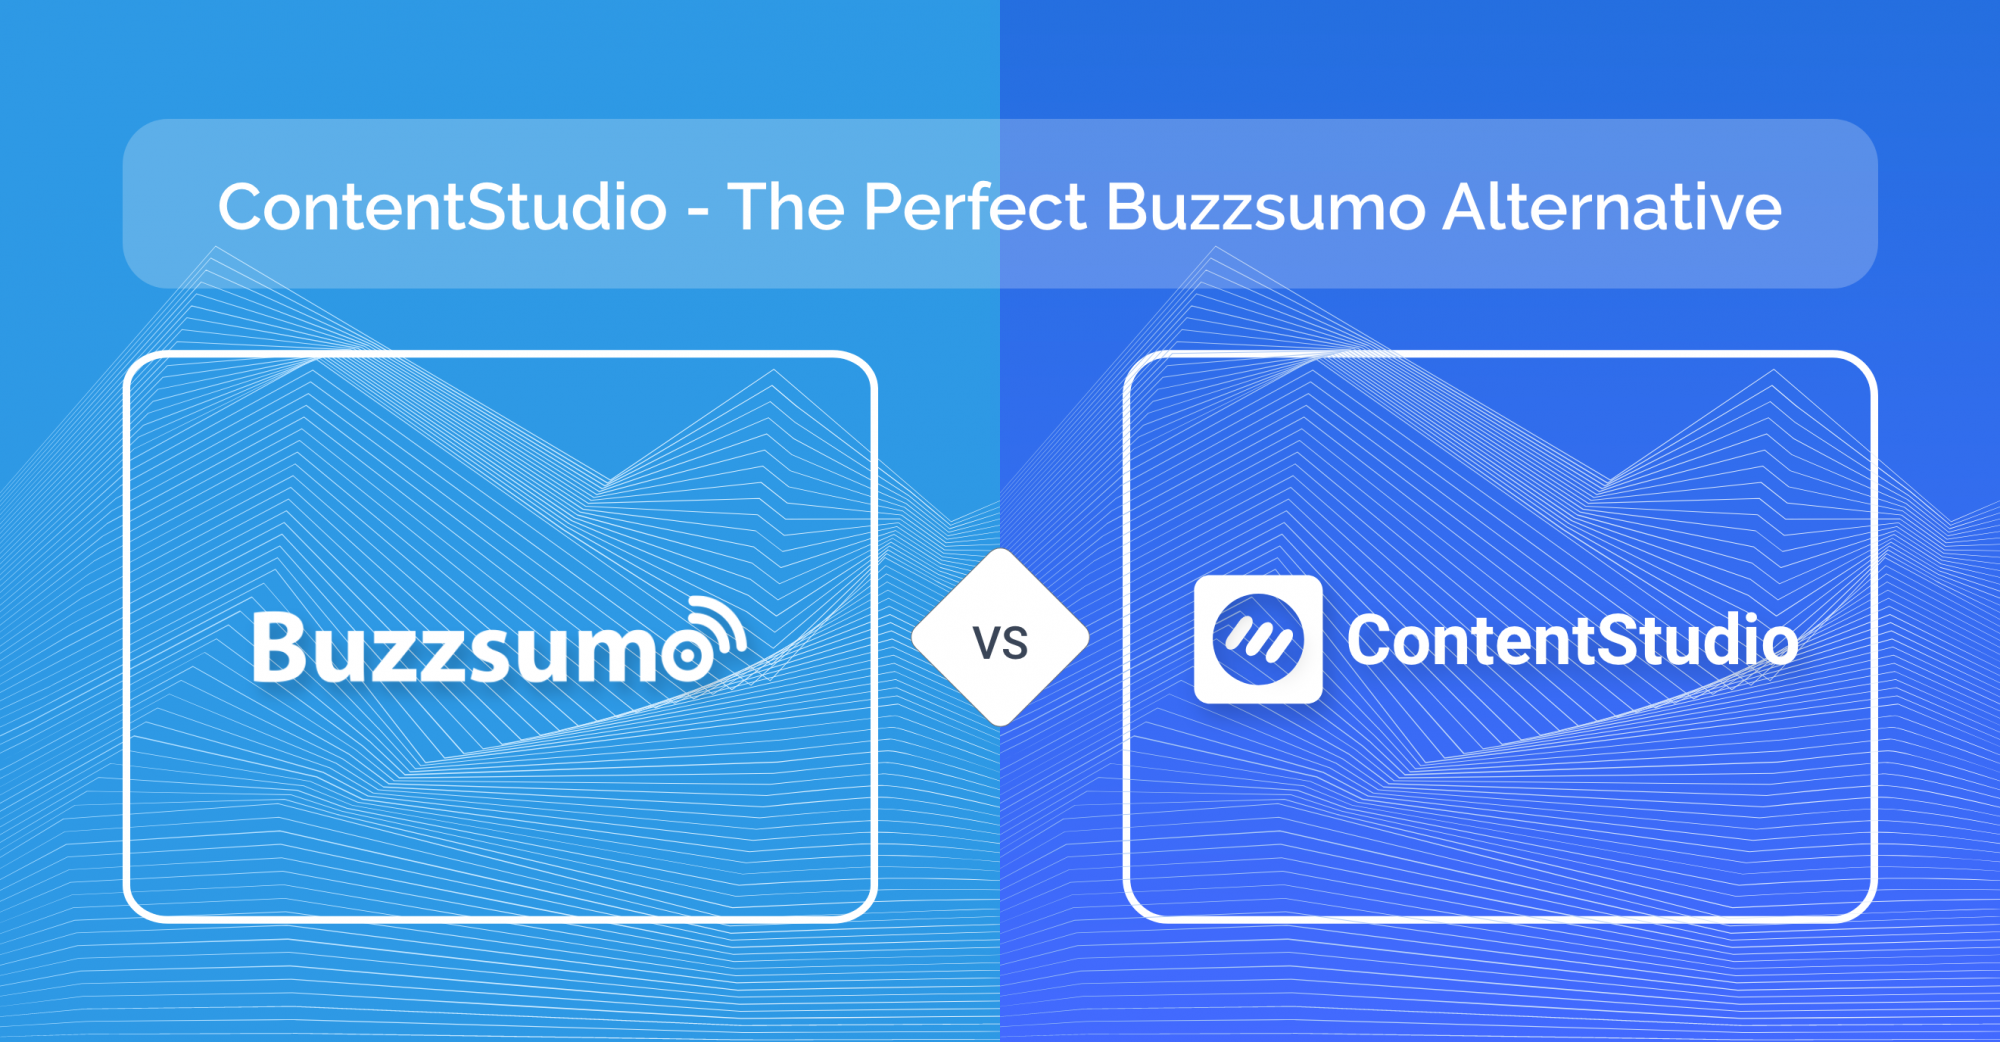 Buzzsumo alternative - ContentStudio